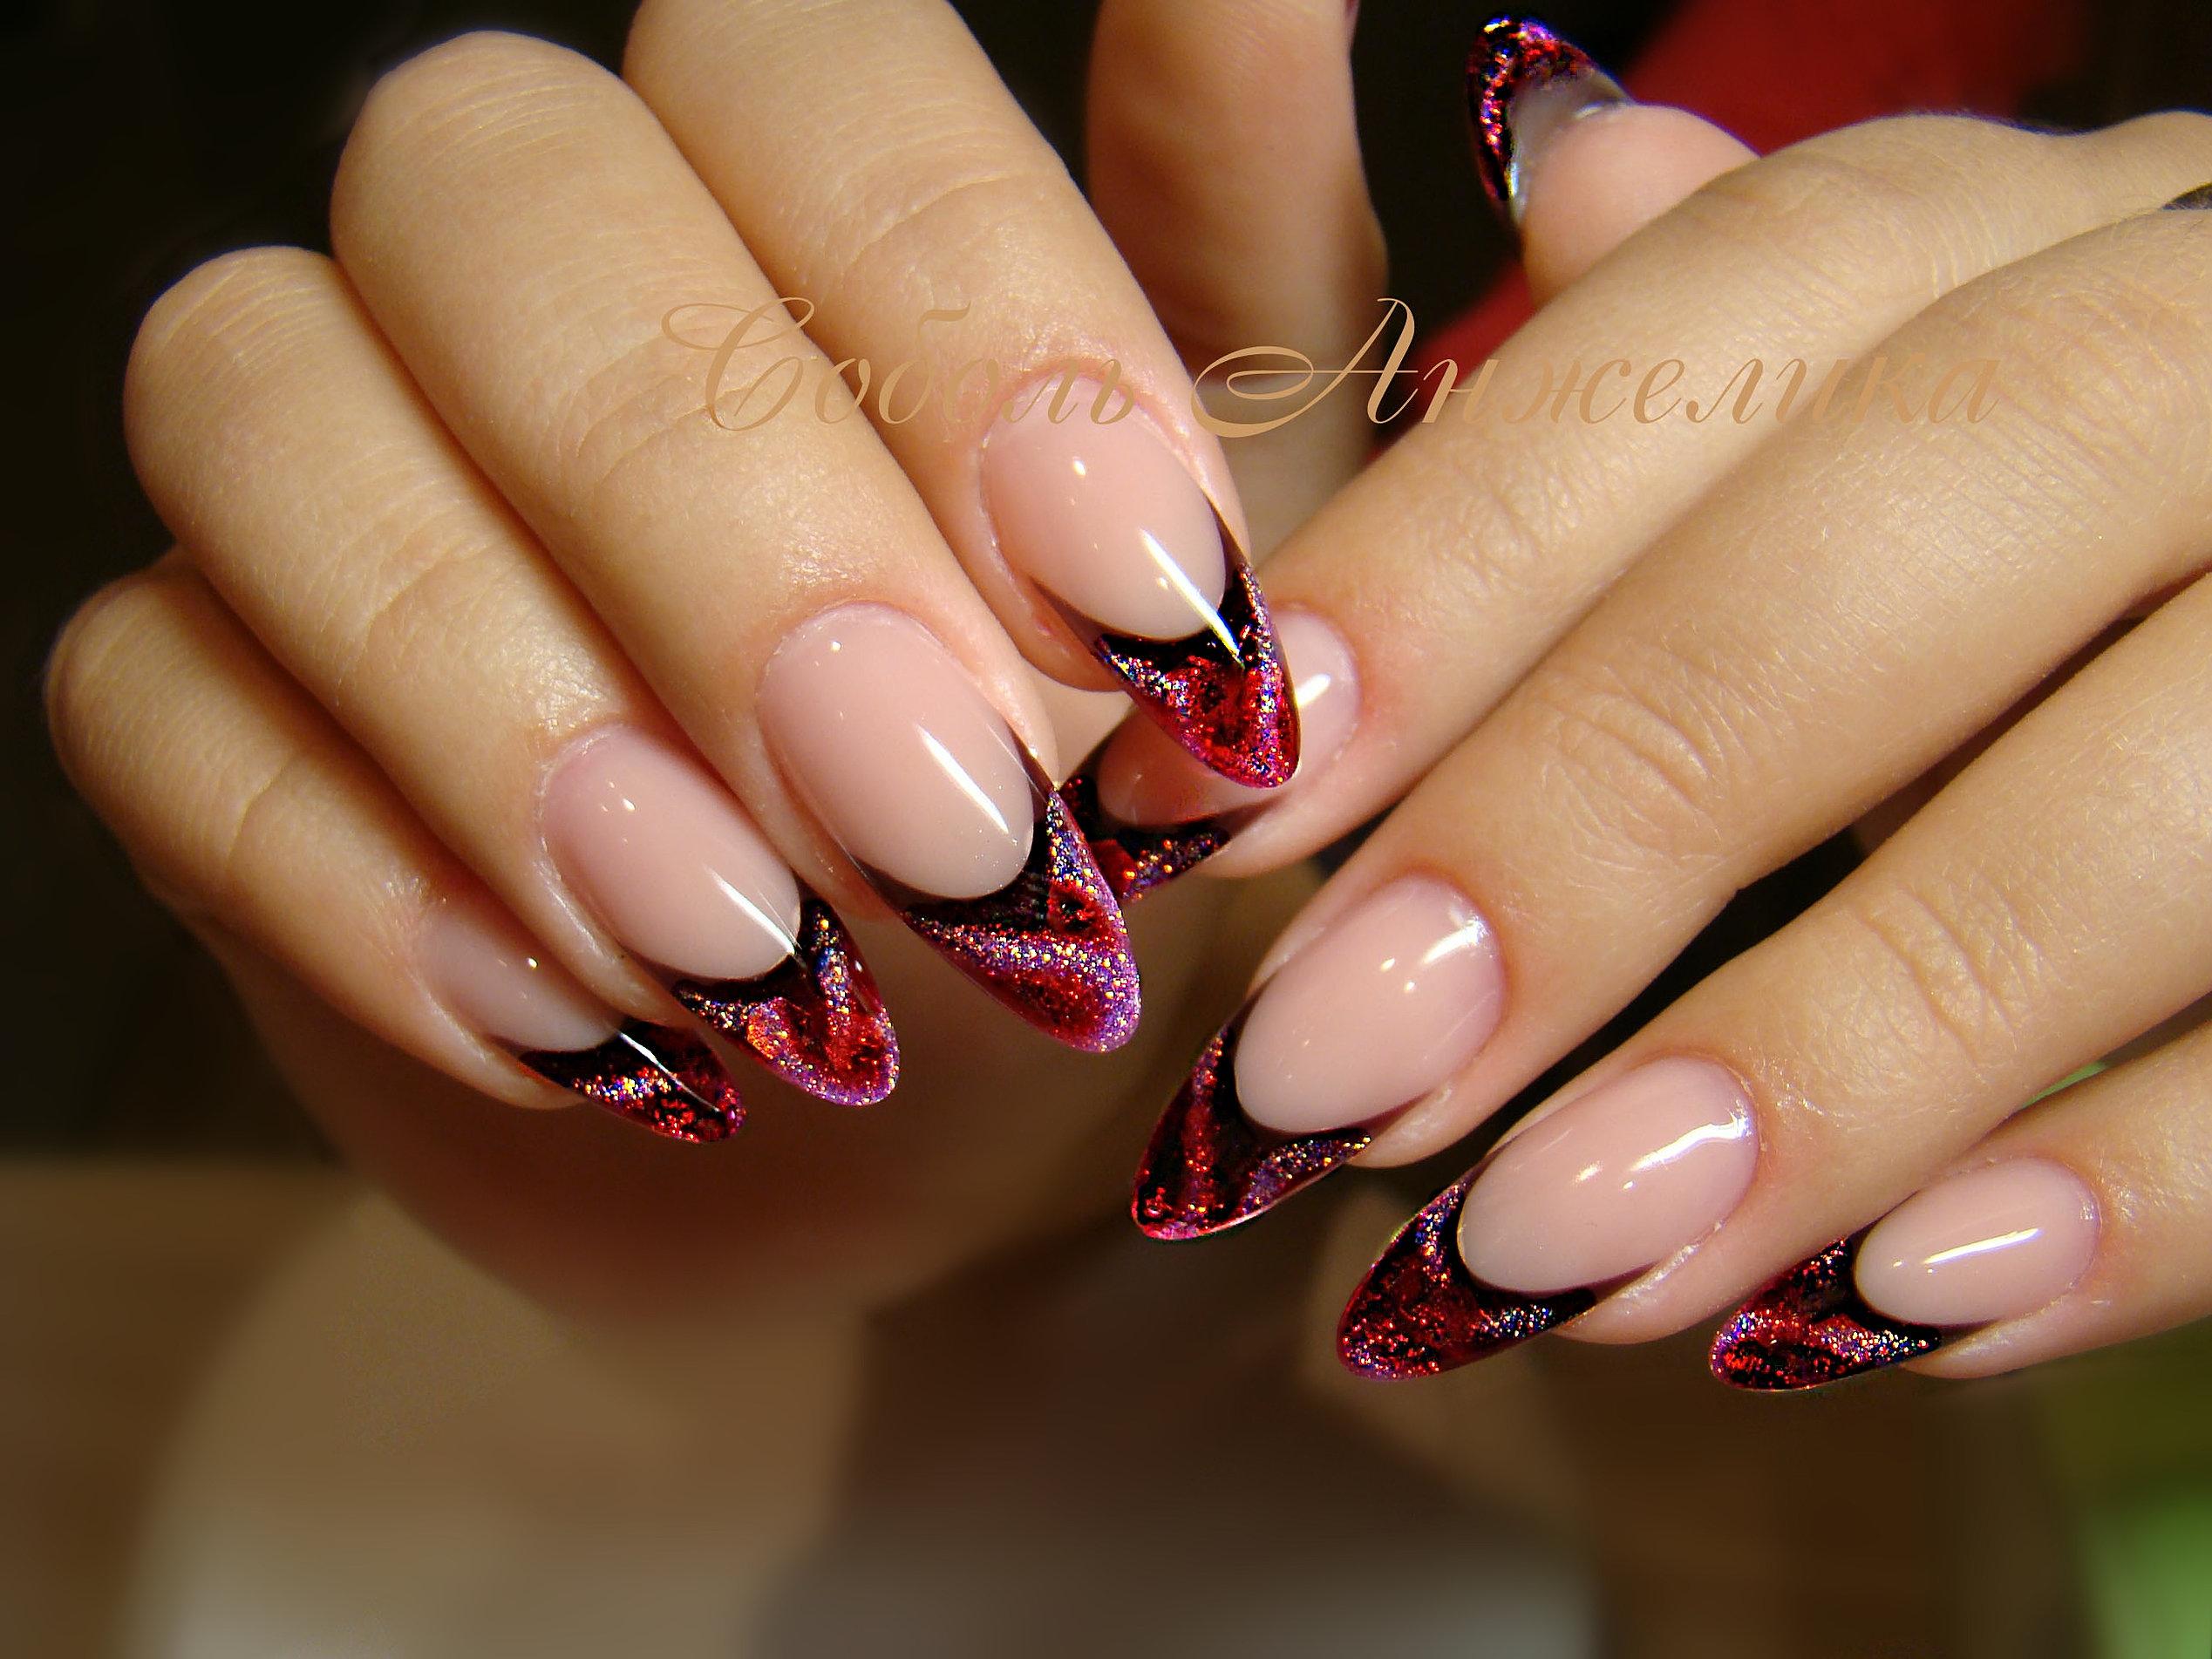 Френч на наложенных ногтях фото